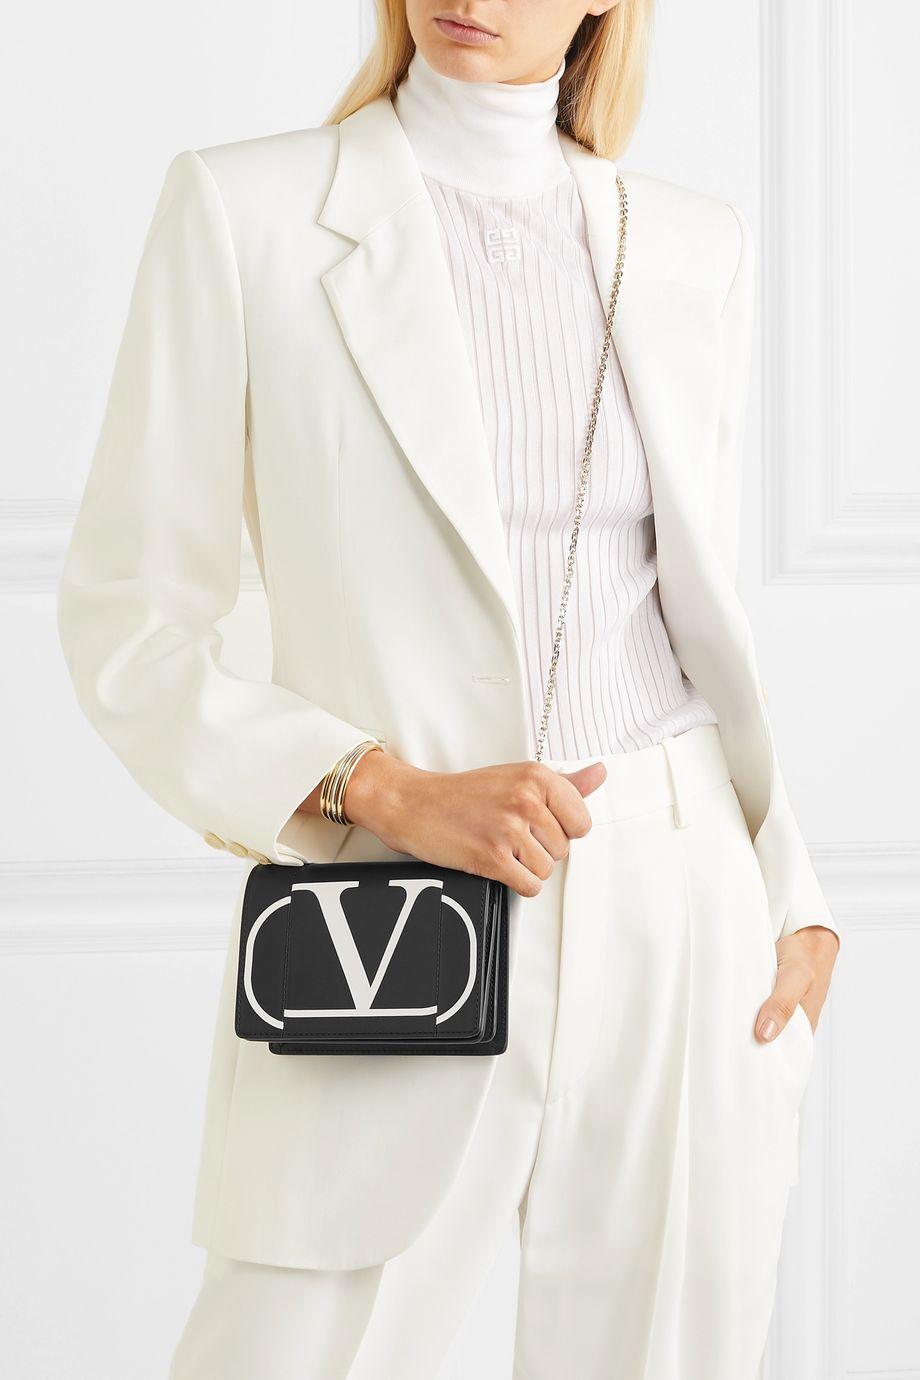 Valentino Valentino Garavani printed leather shoulder bag